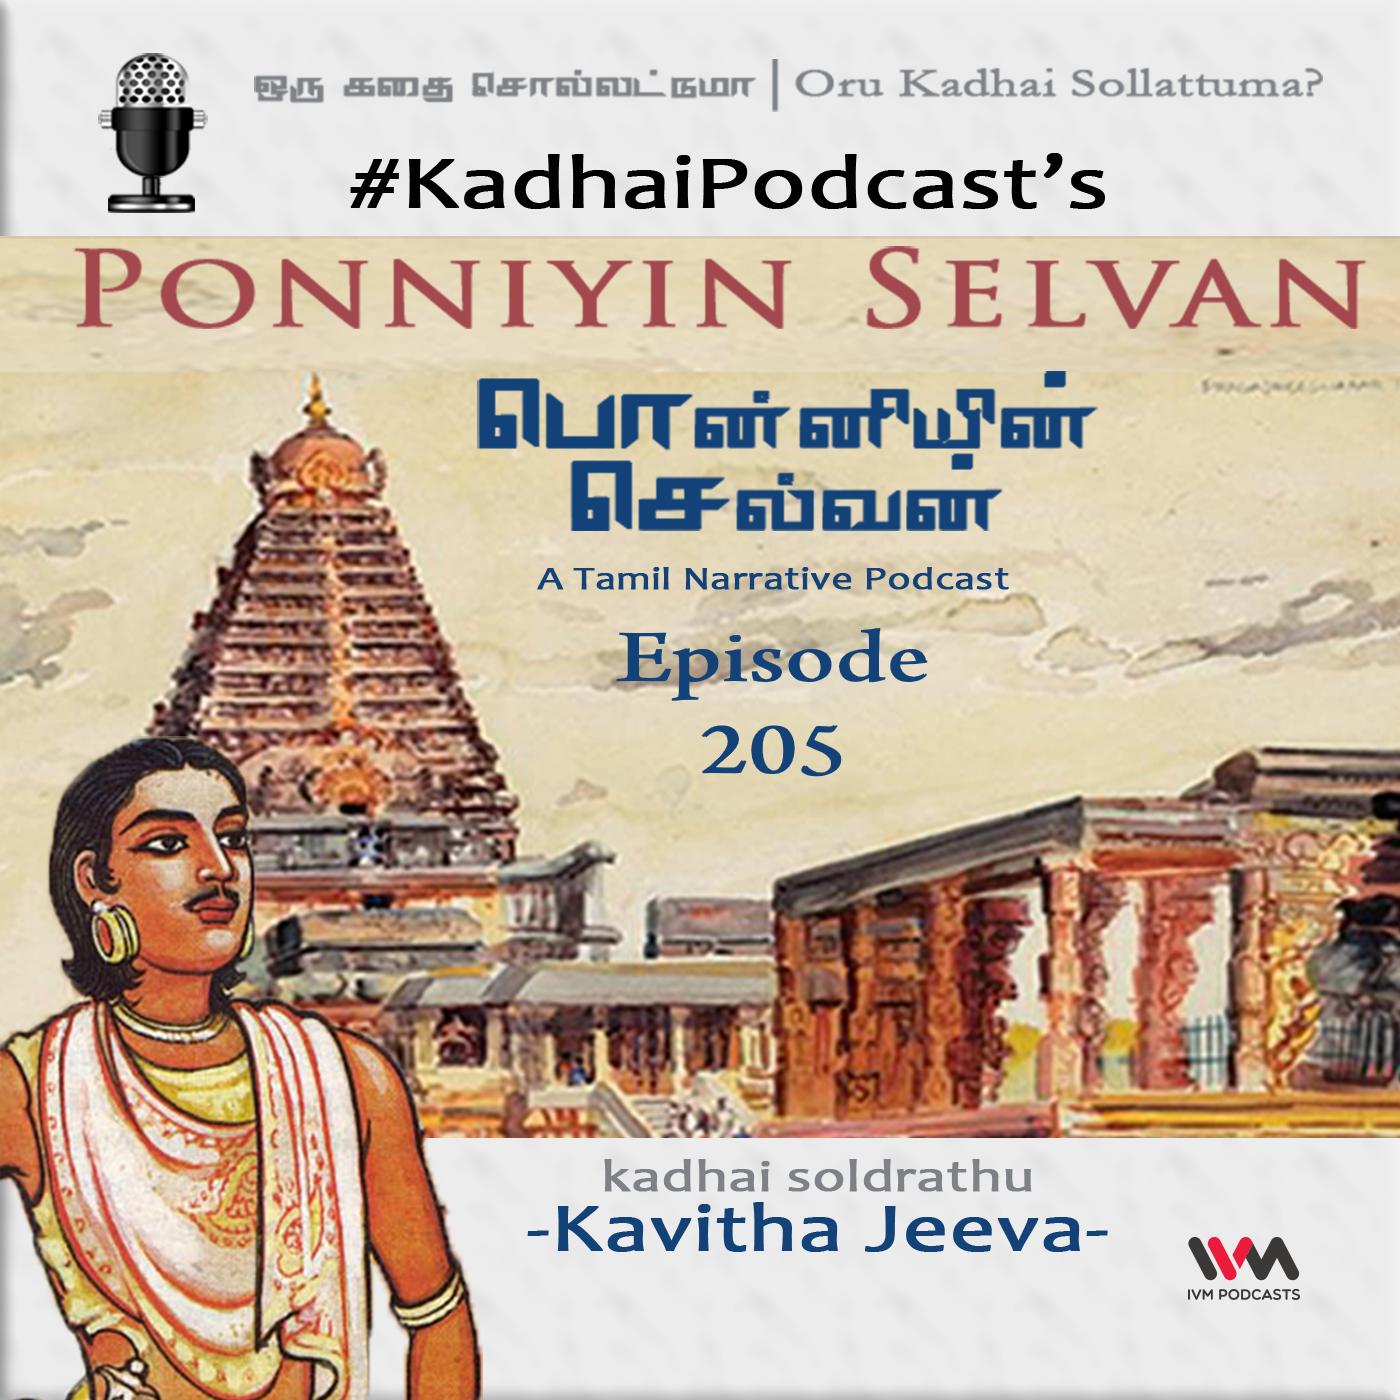 KadhaiPodcast's Ponniyin Selvan - Episode # 205